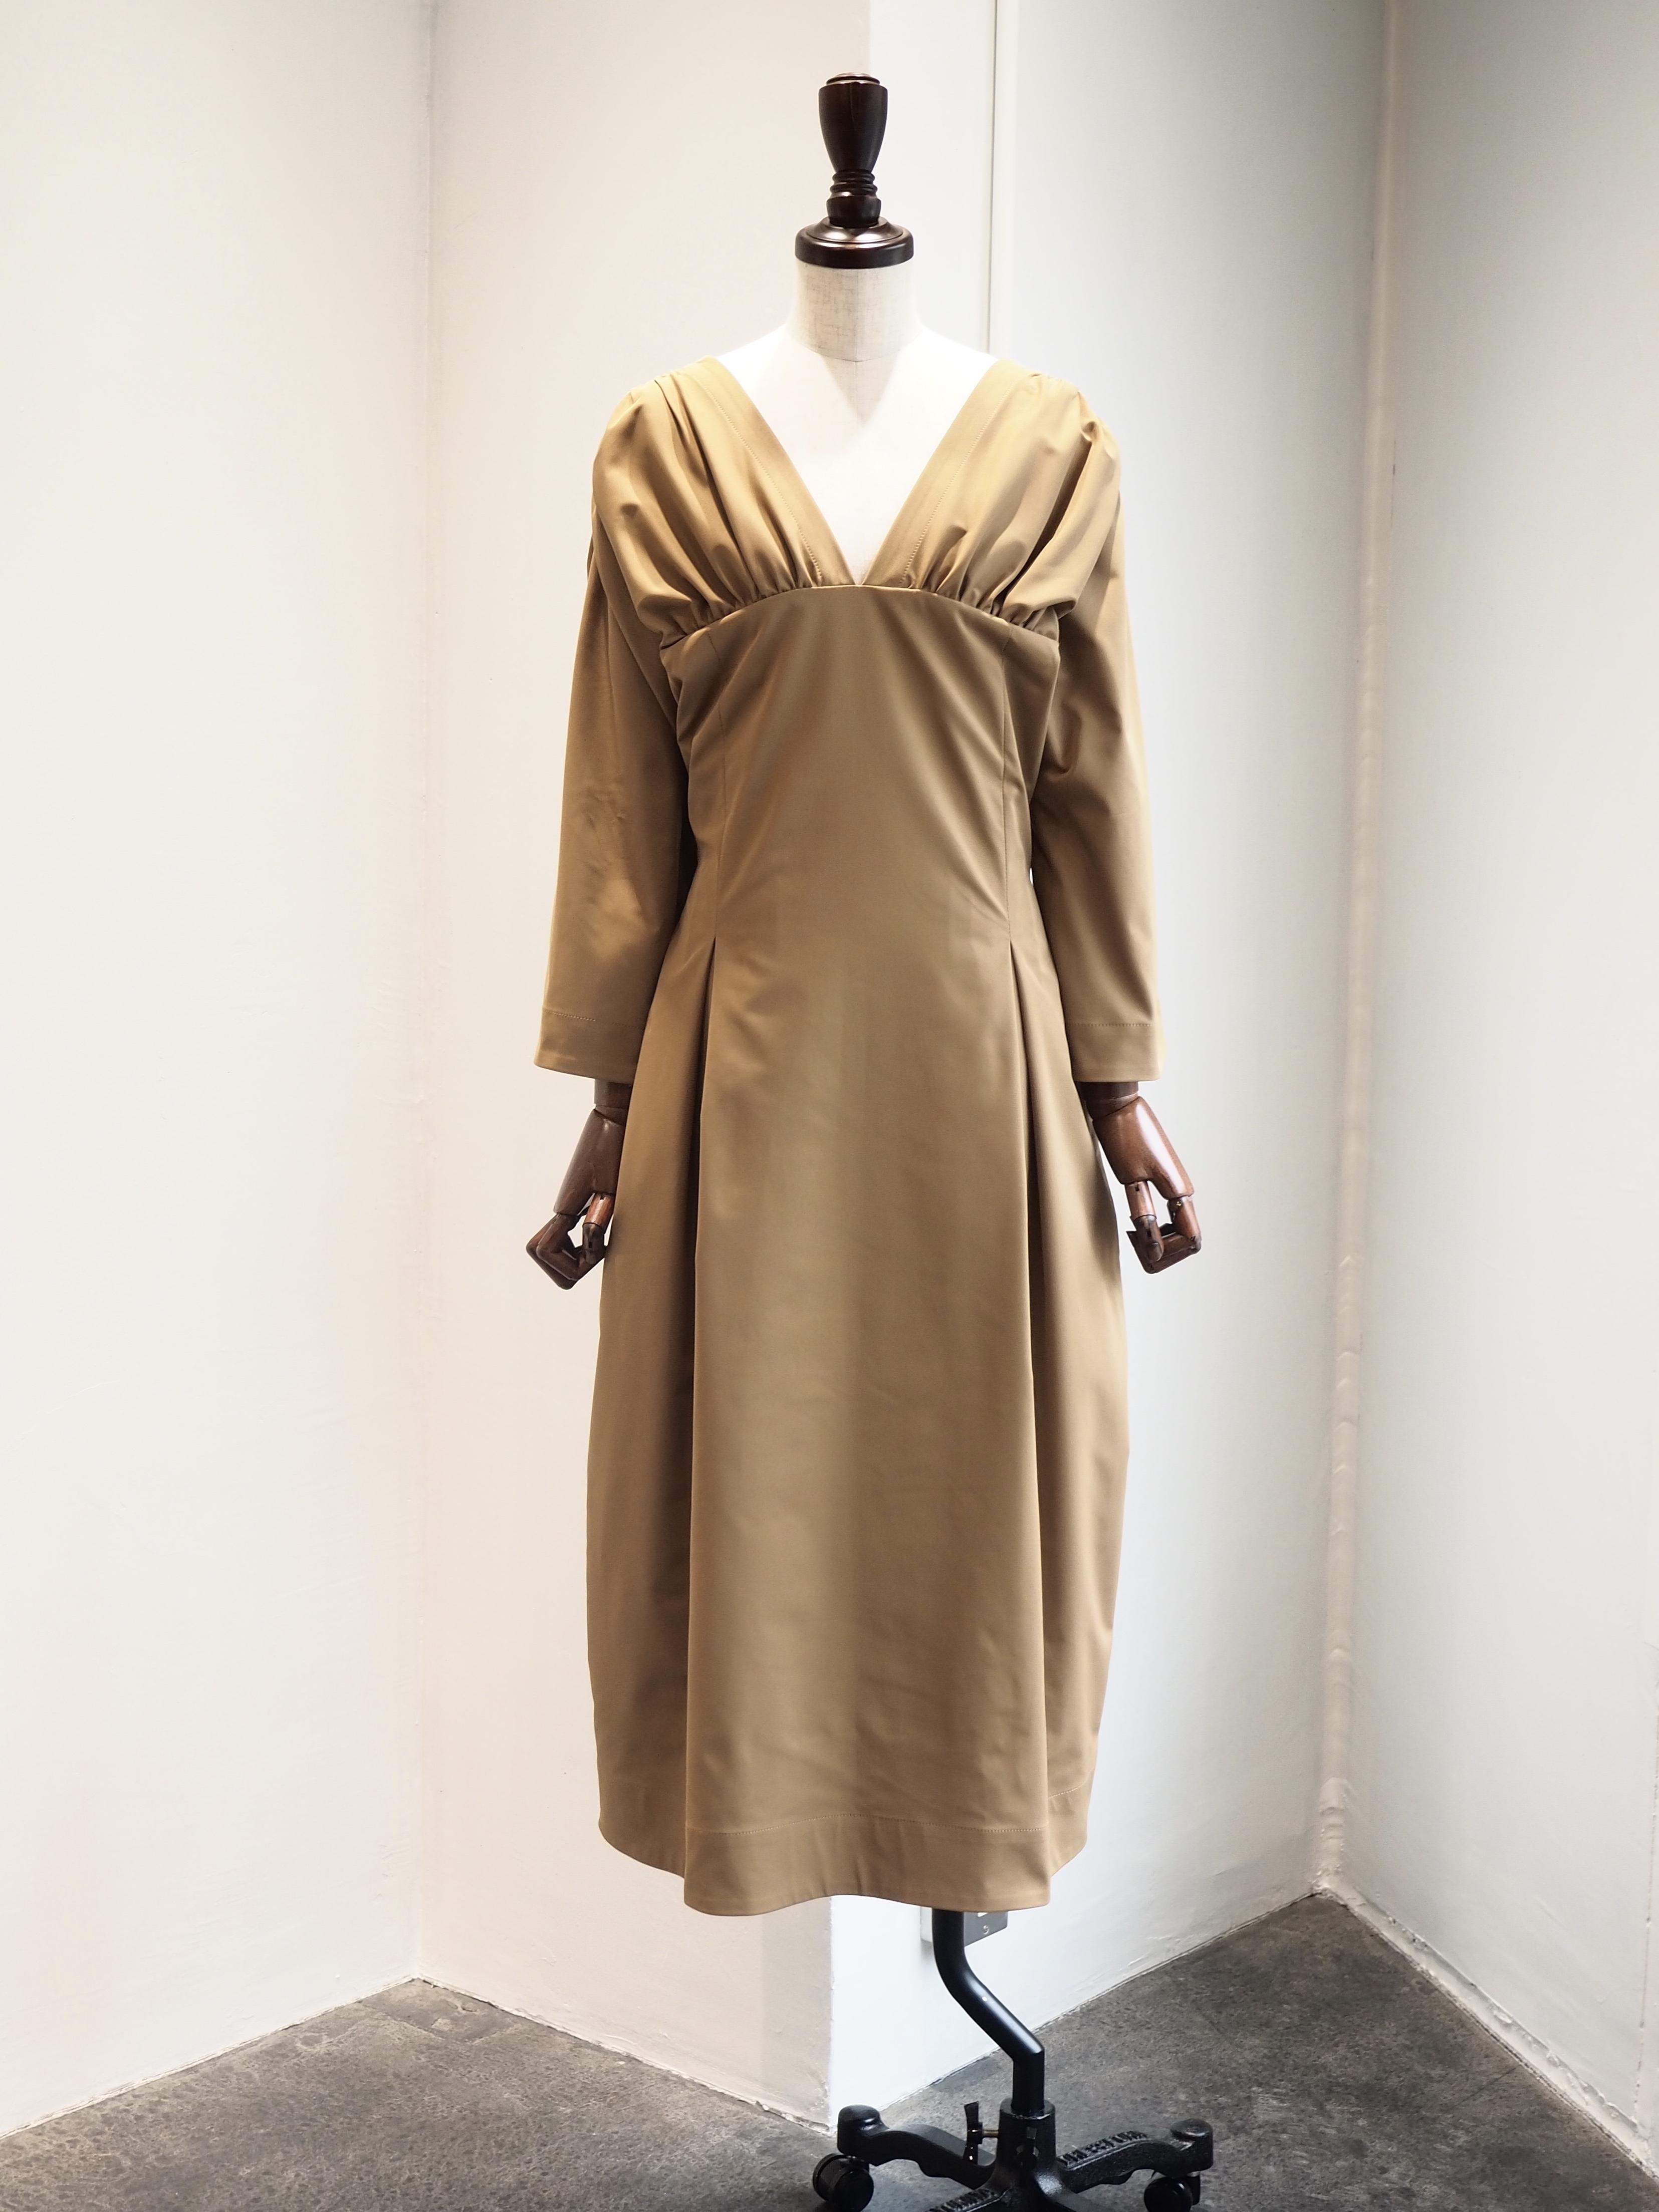 【ELIN】GATHERED CORSET DRESS